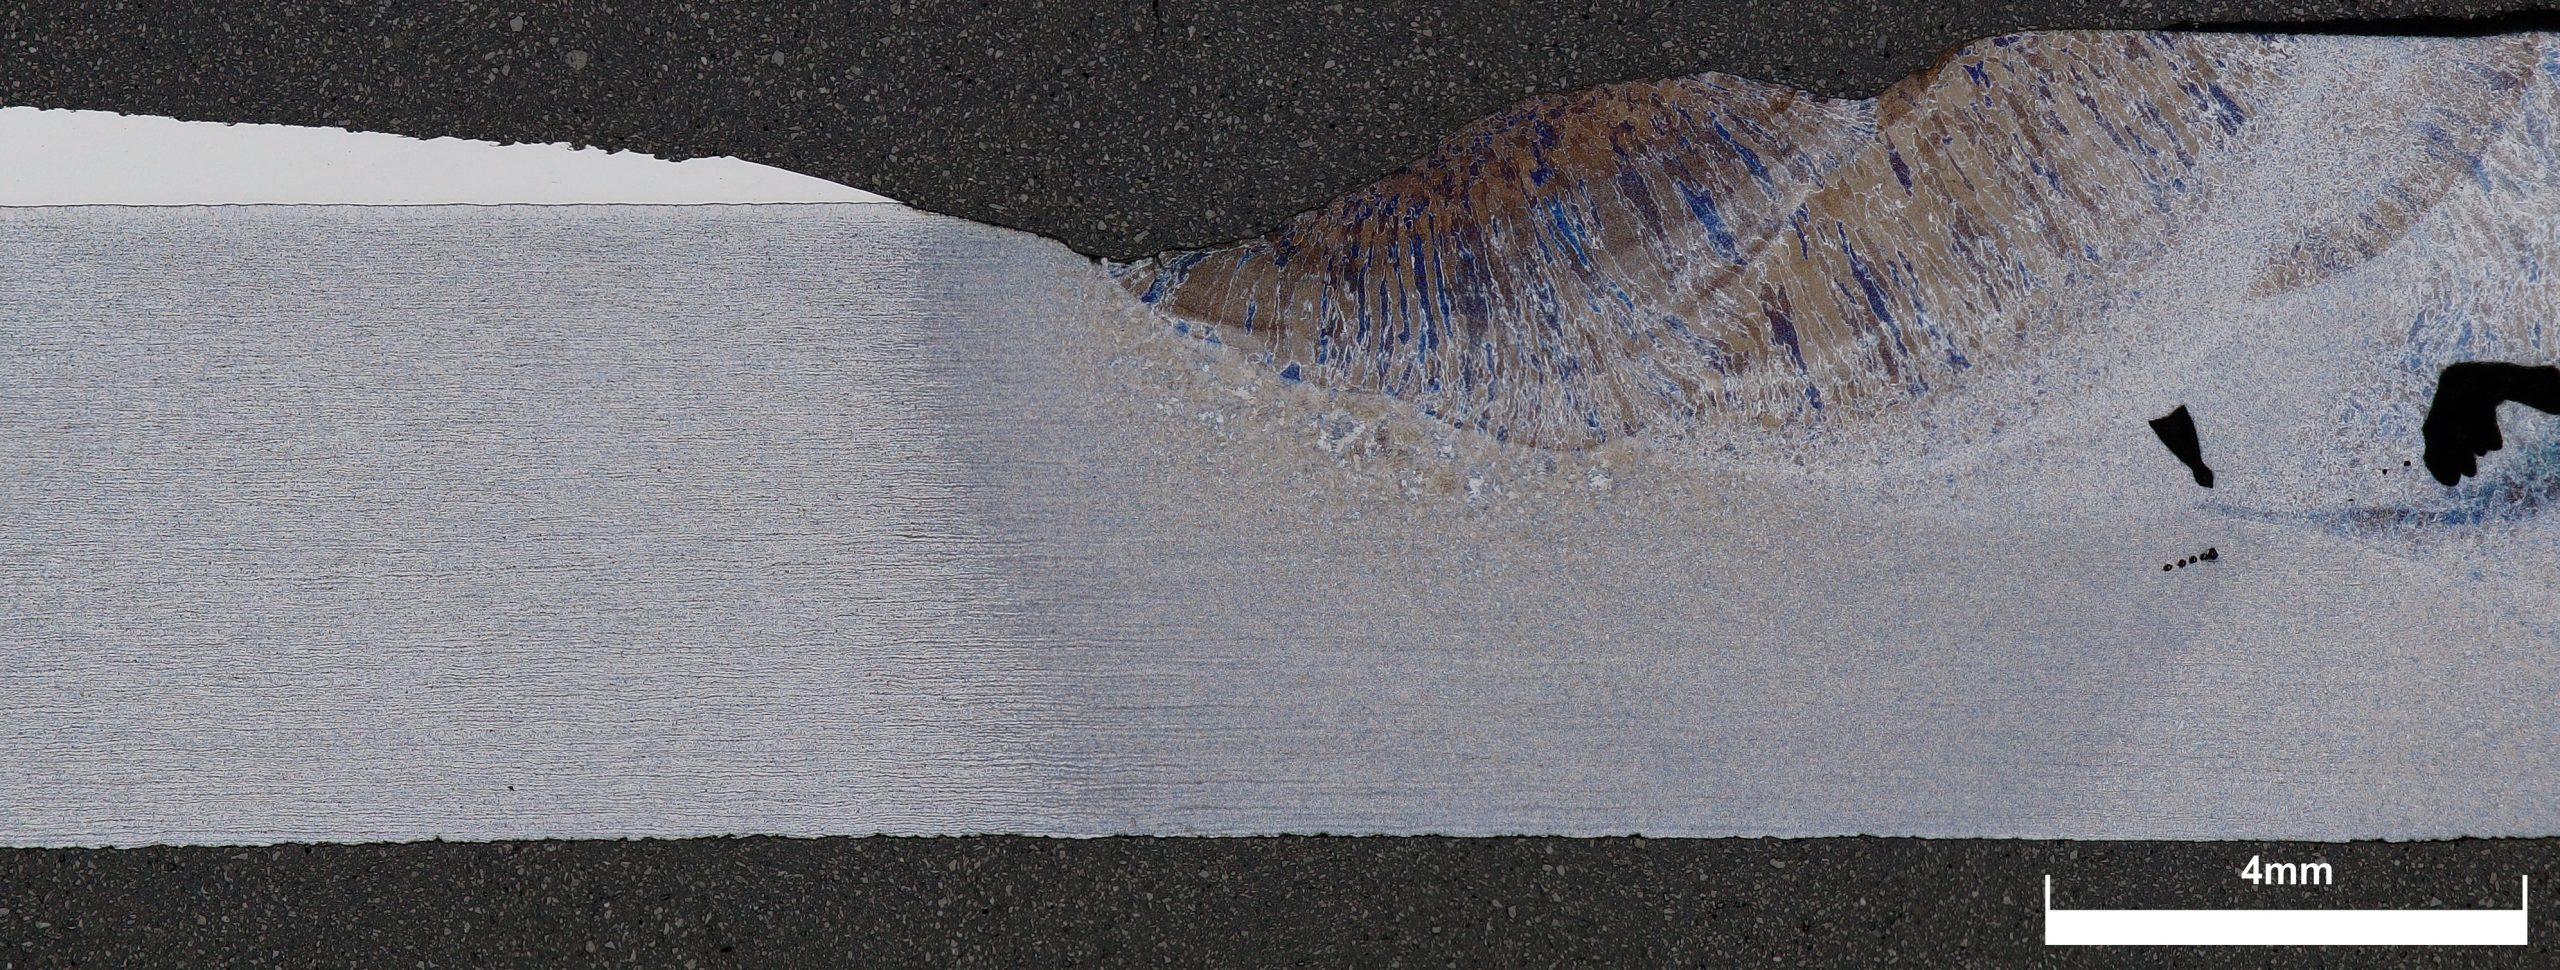 Digital microscopy, etched weld